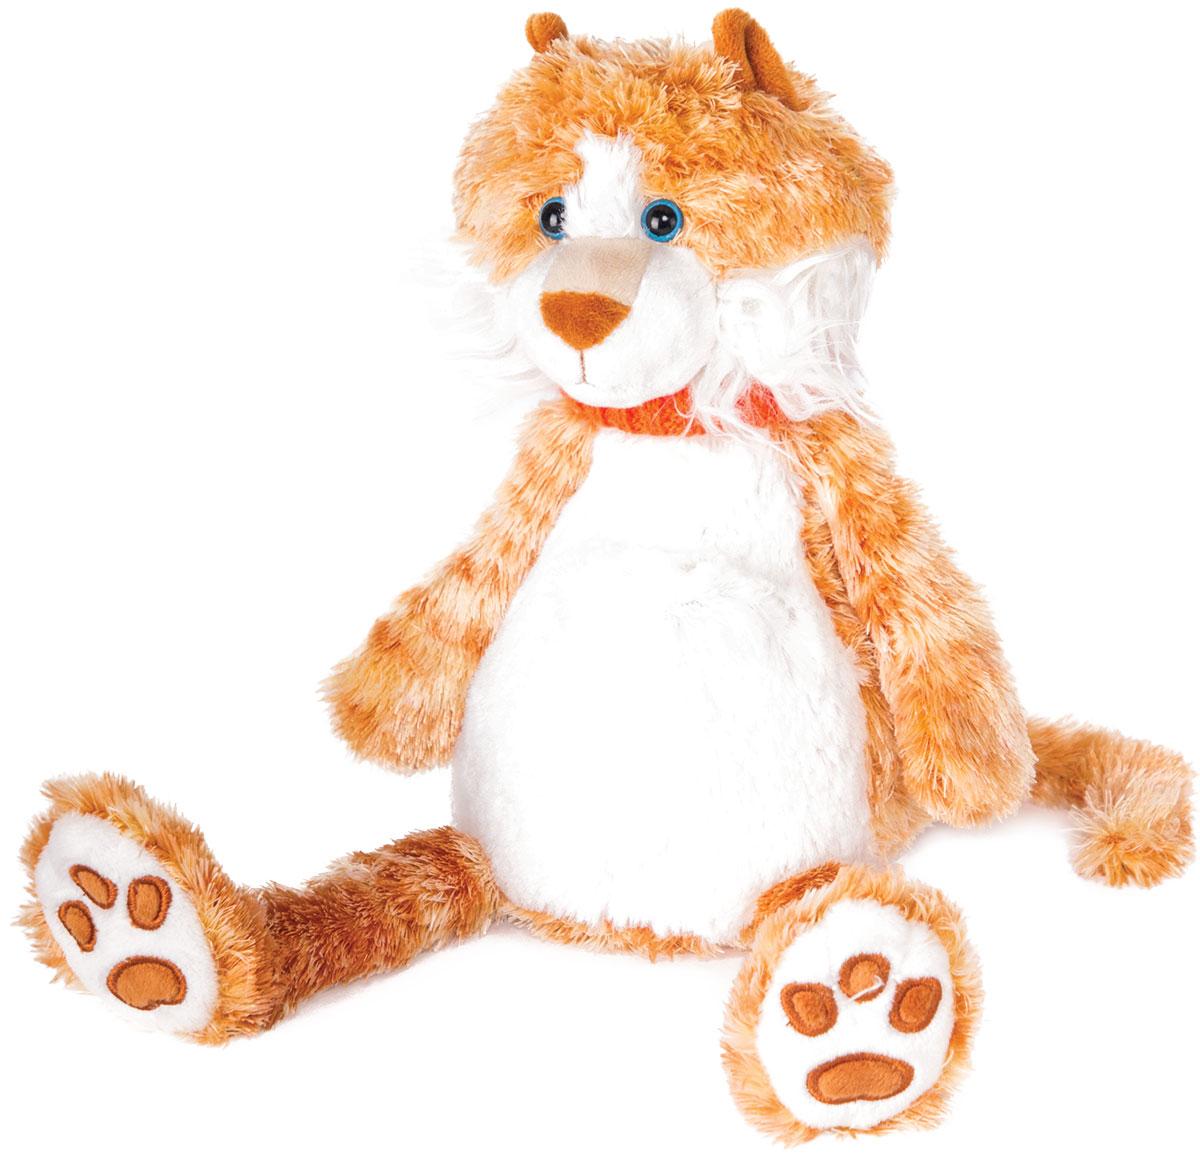 Gulliver Мягкая игрушка Котик Барсик 20 см игрушка мягкая gulliver кукла хозяюшка 30см